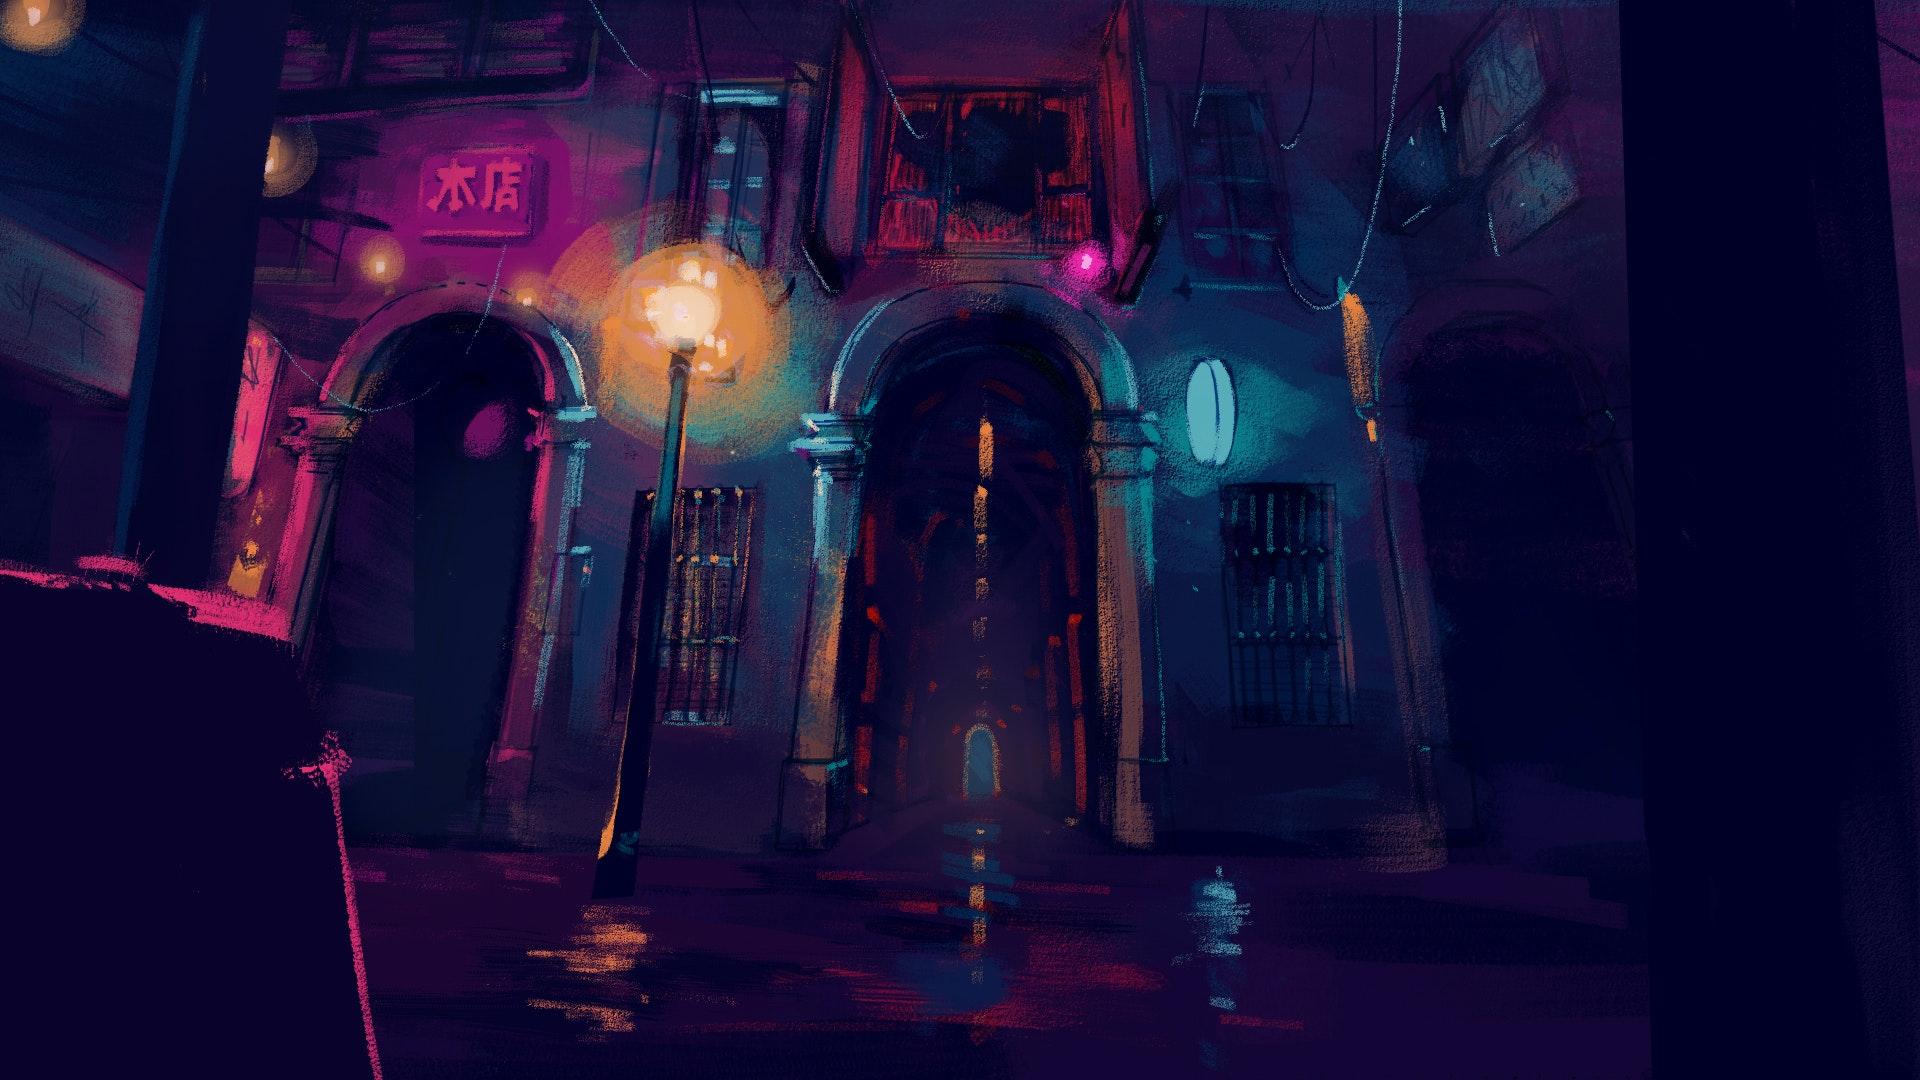 Illustration of an empty street